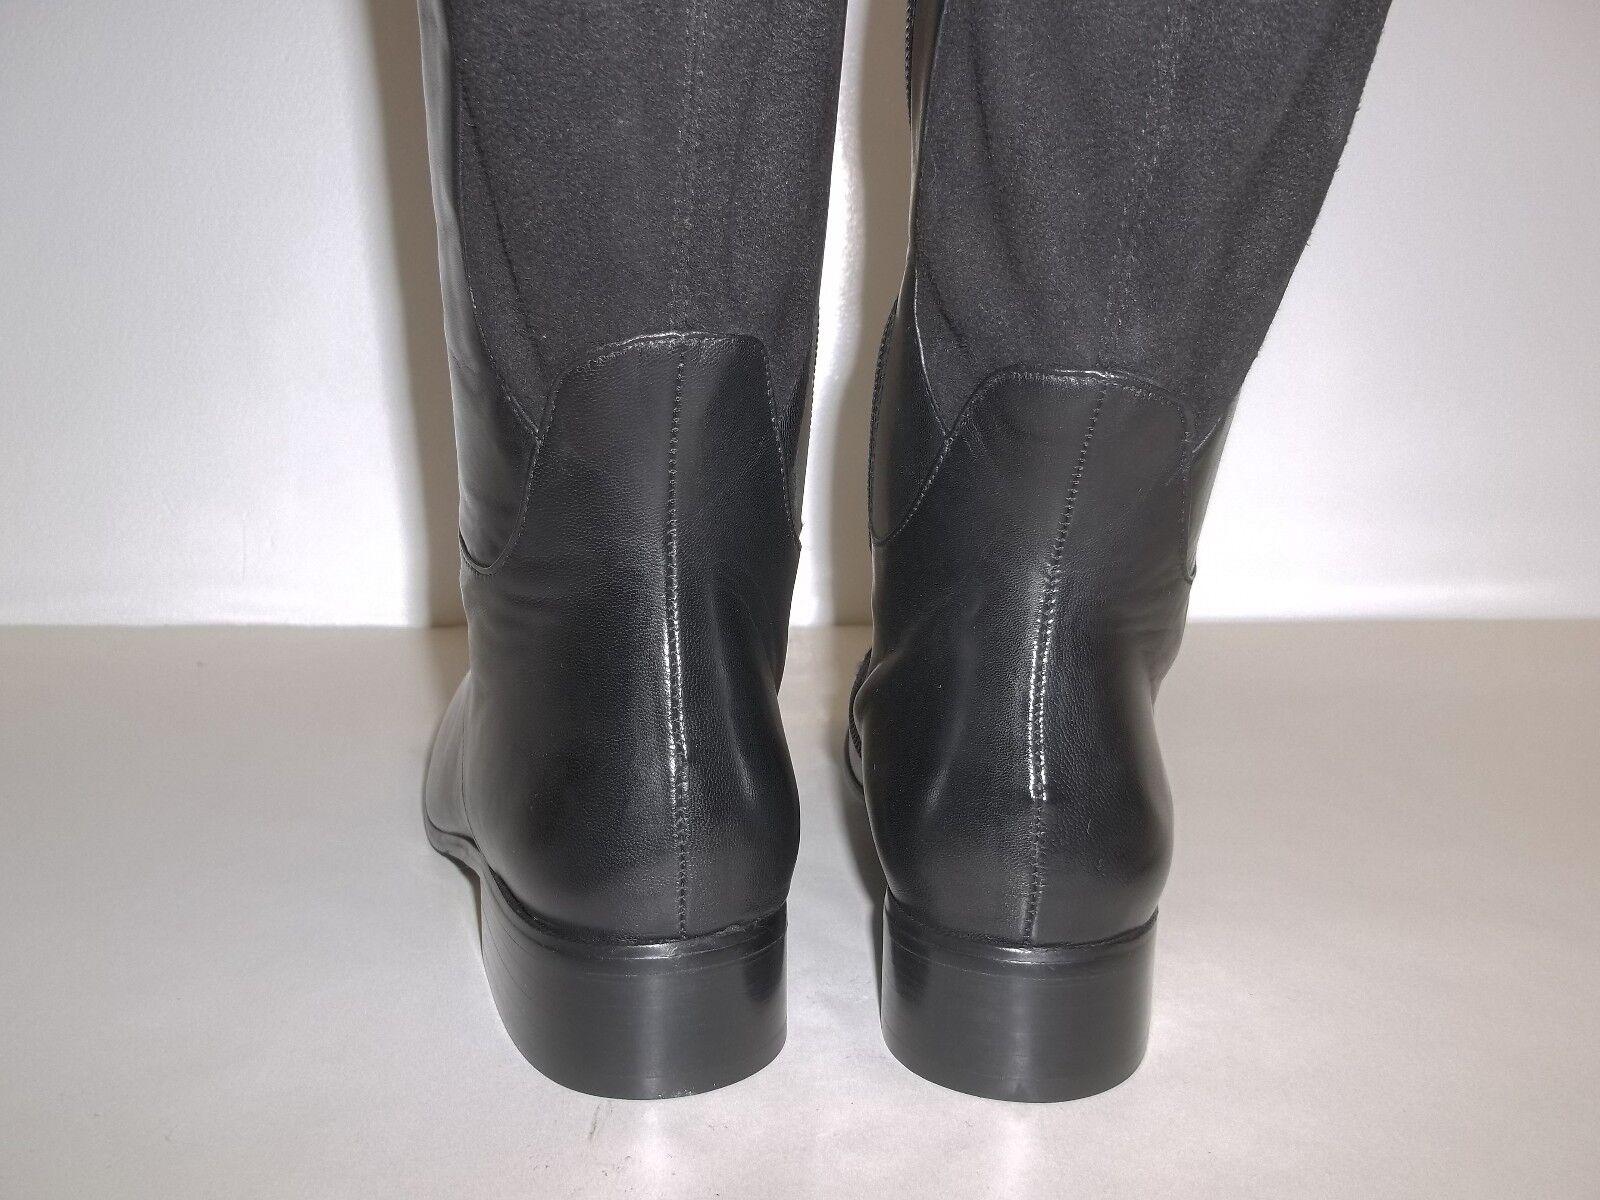 VANELi VANELi VANELi Van Eli Size 6.5 W Wide RAMEX Black Leather Boots New Womens Shoes 1015d3